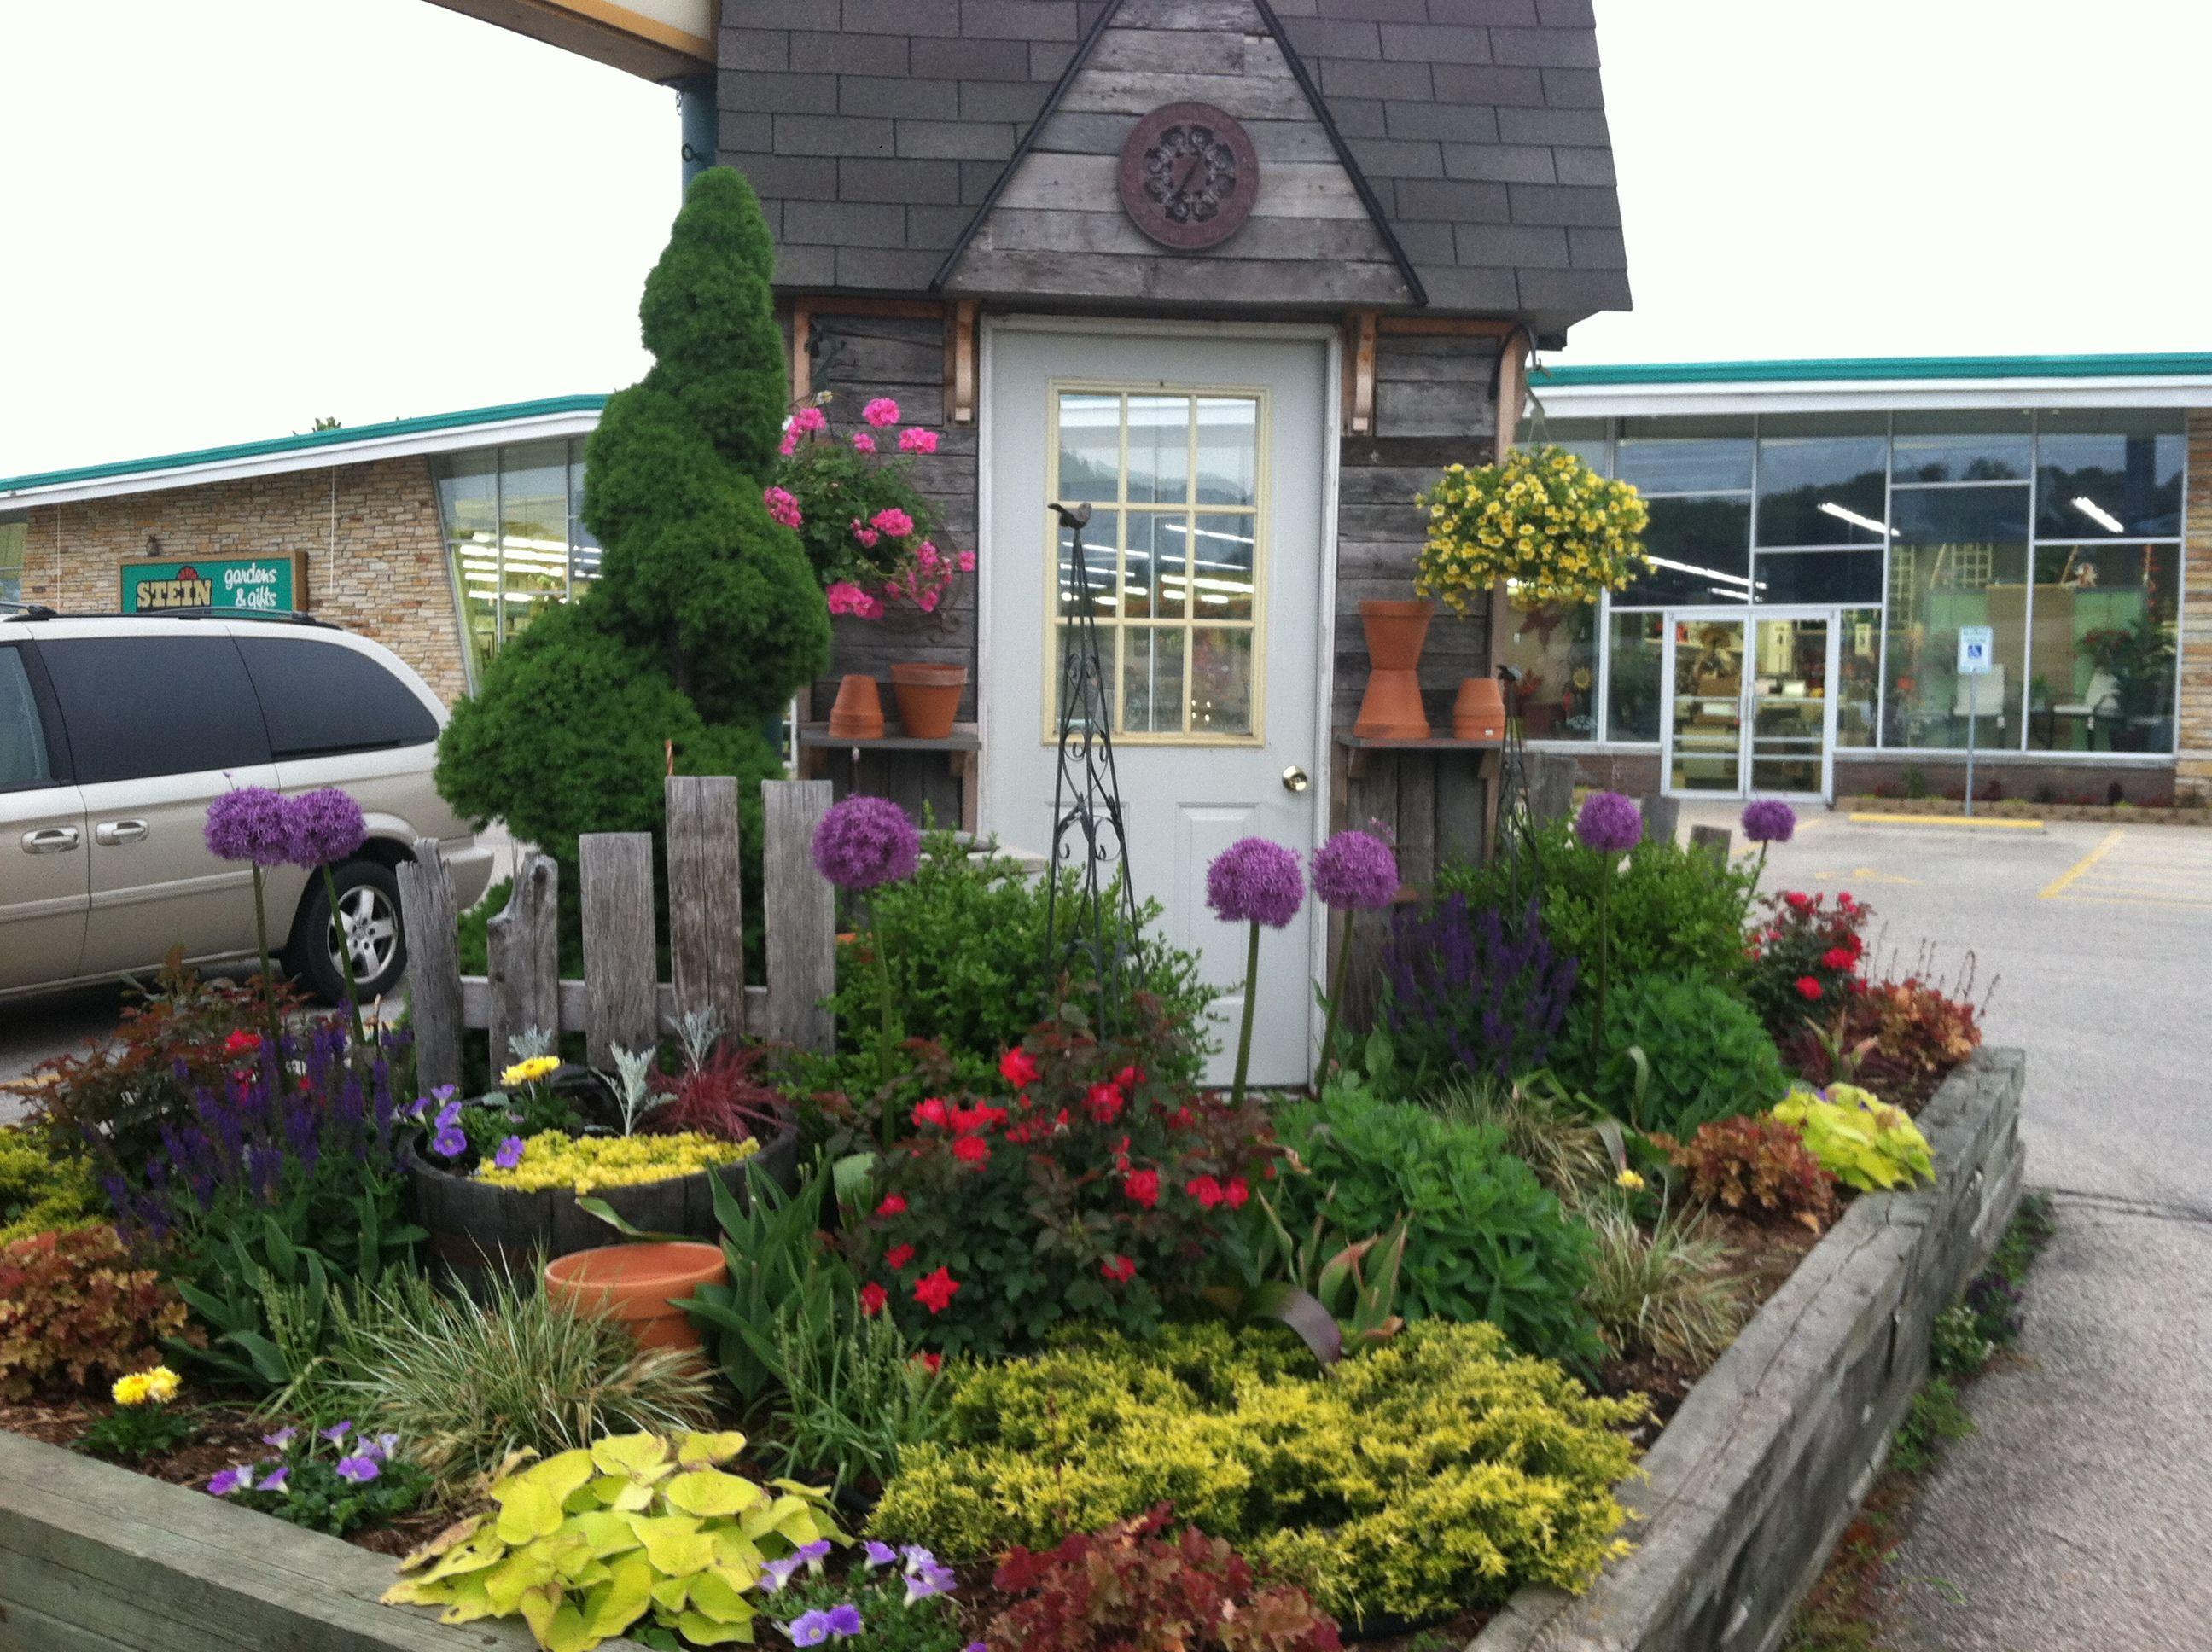 Pin By Dan Hatland On Garden Center Garden Center Plant Nursery Garden Center Displays